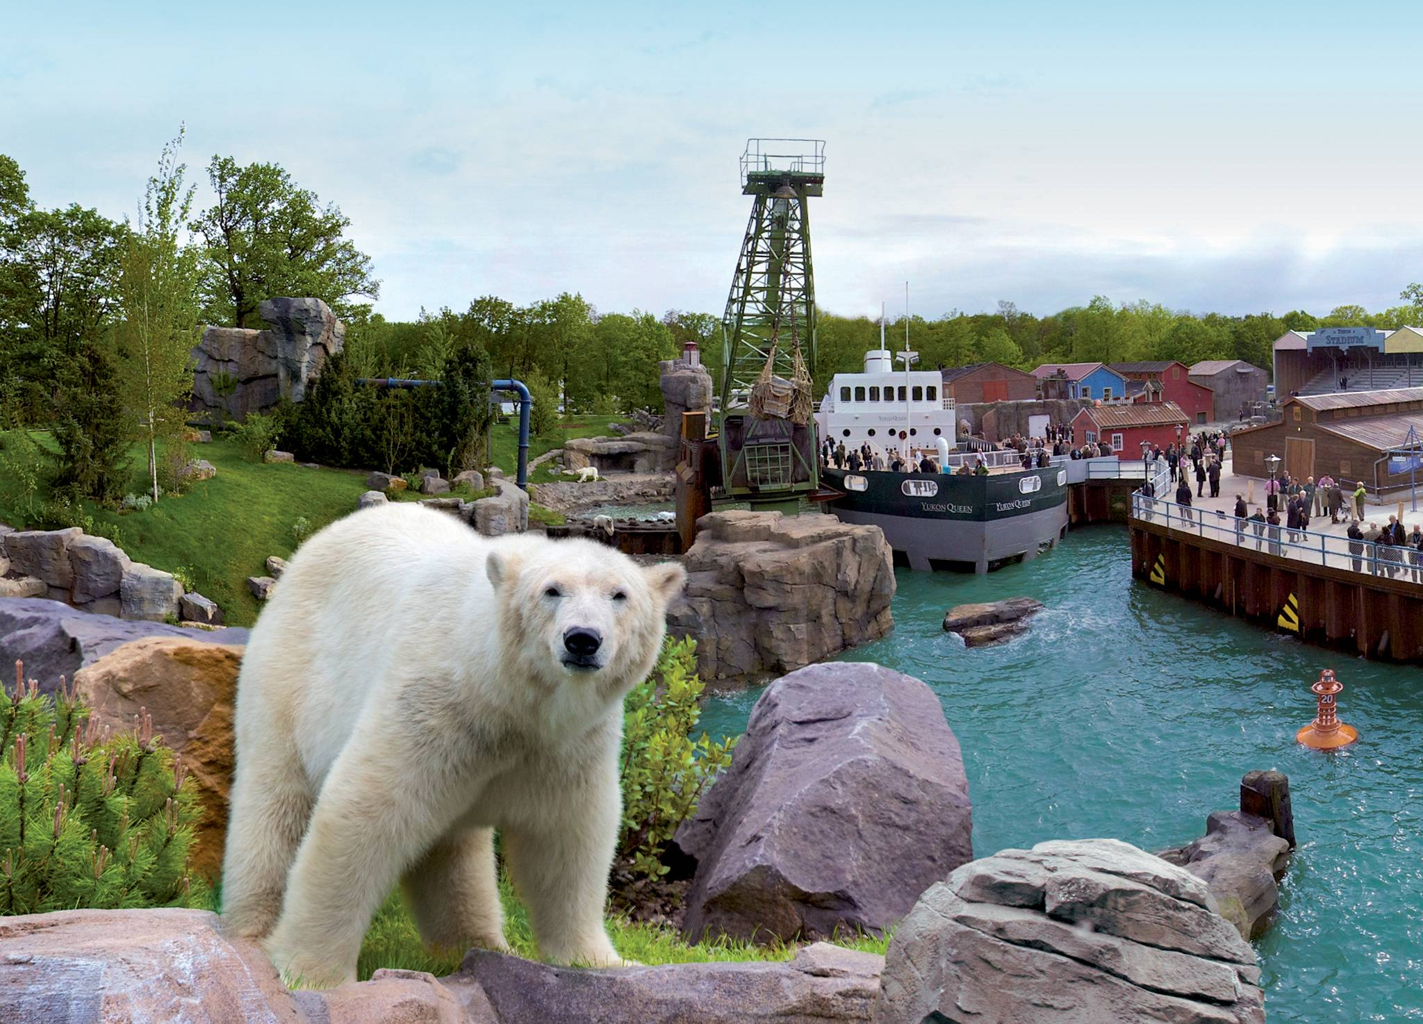 Yukon Bay Eroeffnung im Zoo Hannover